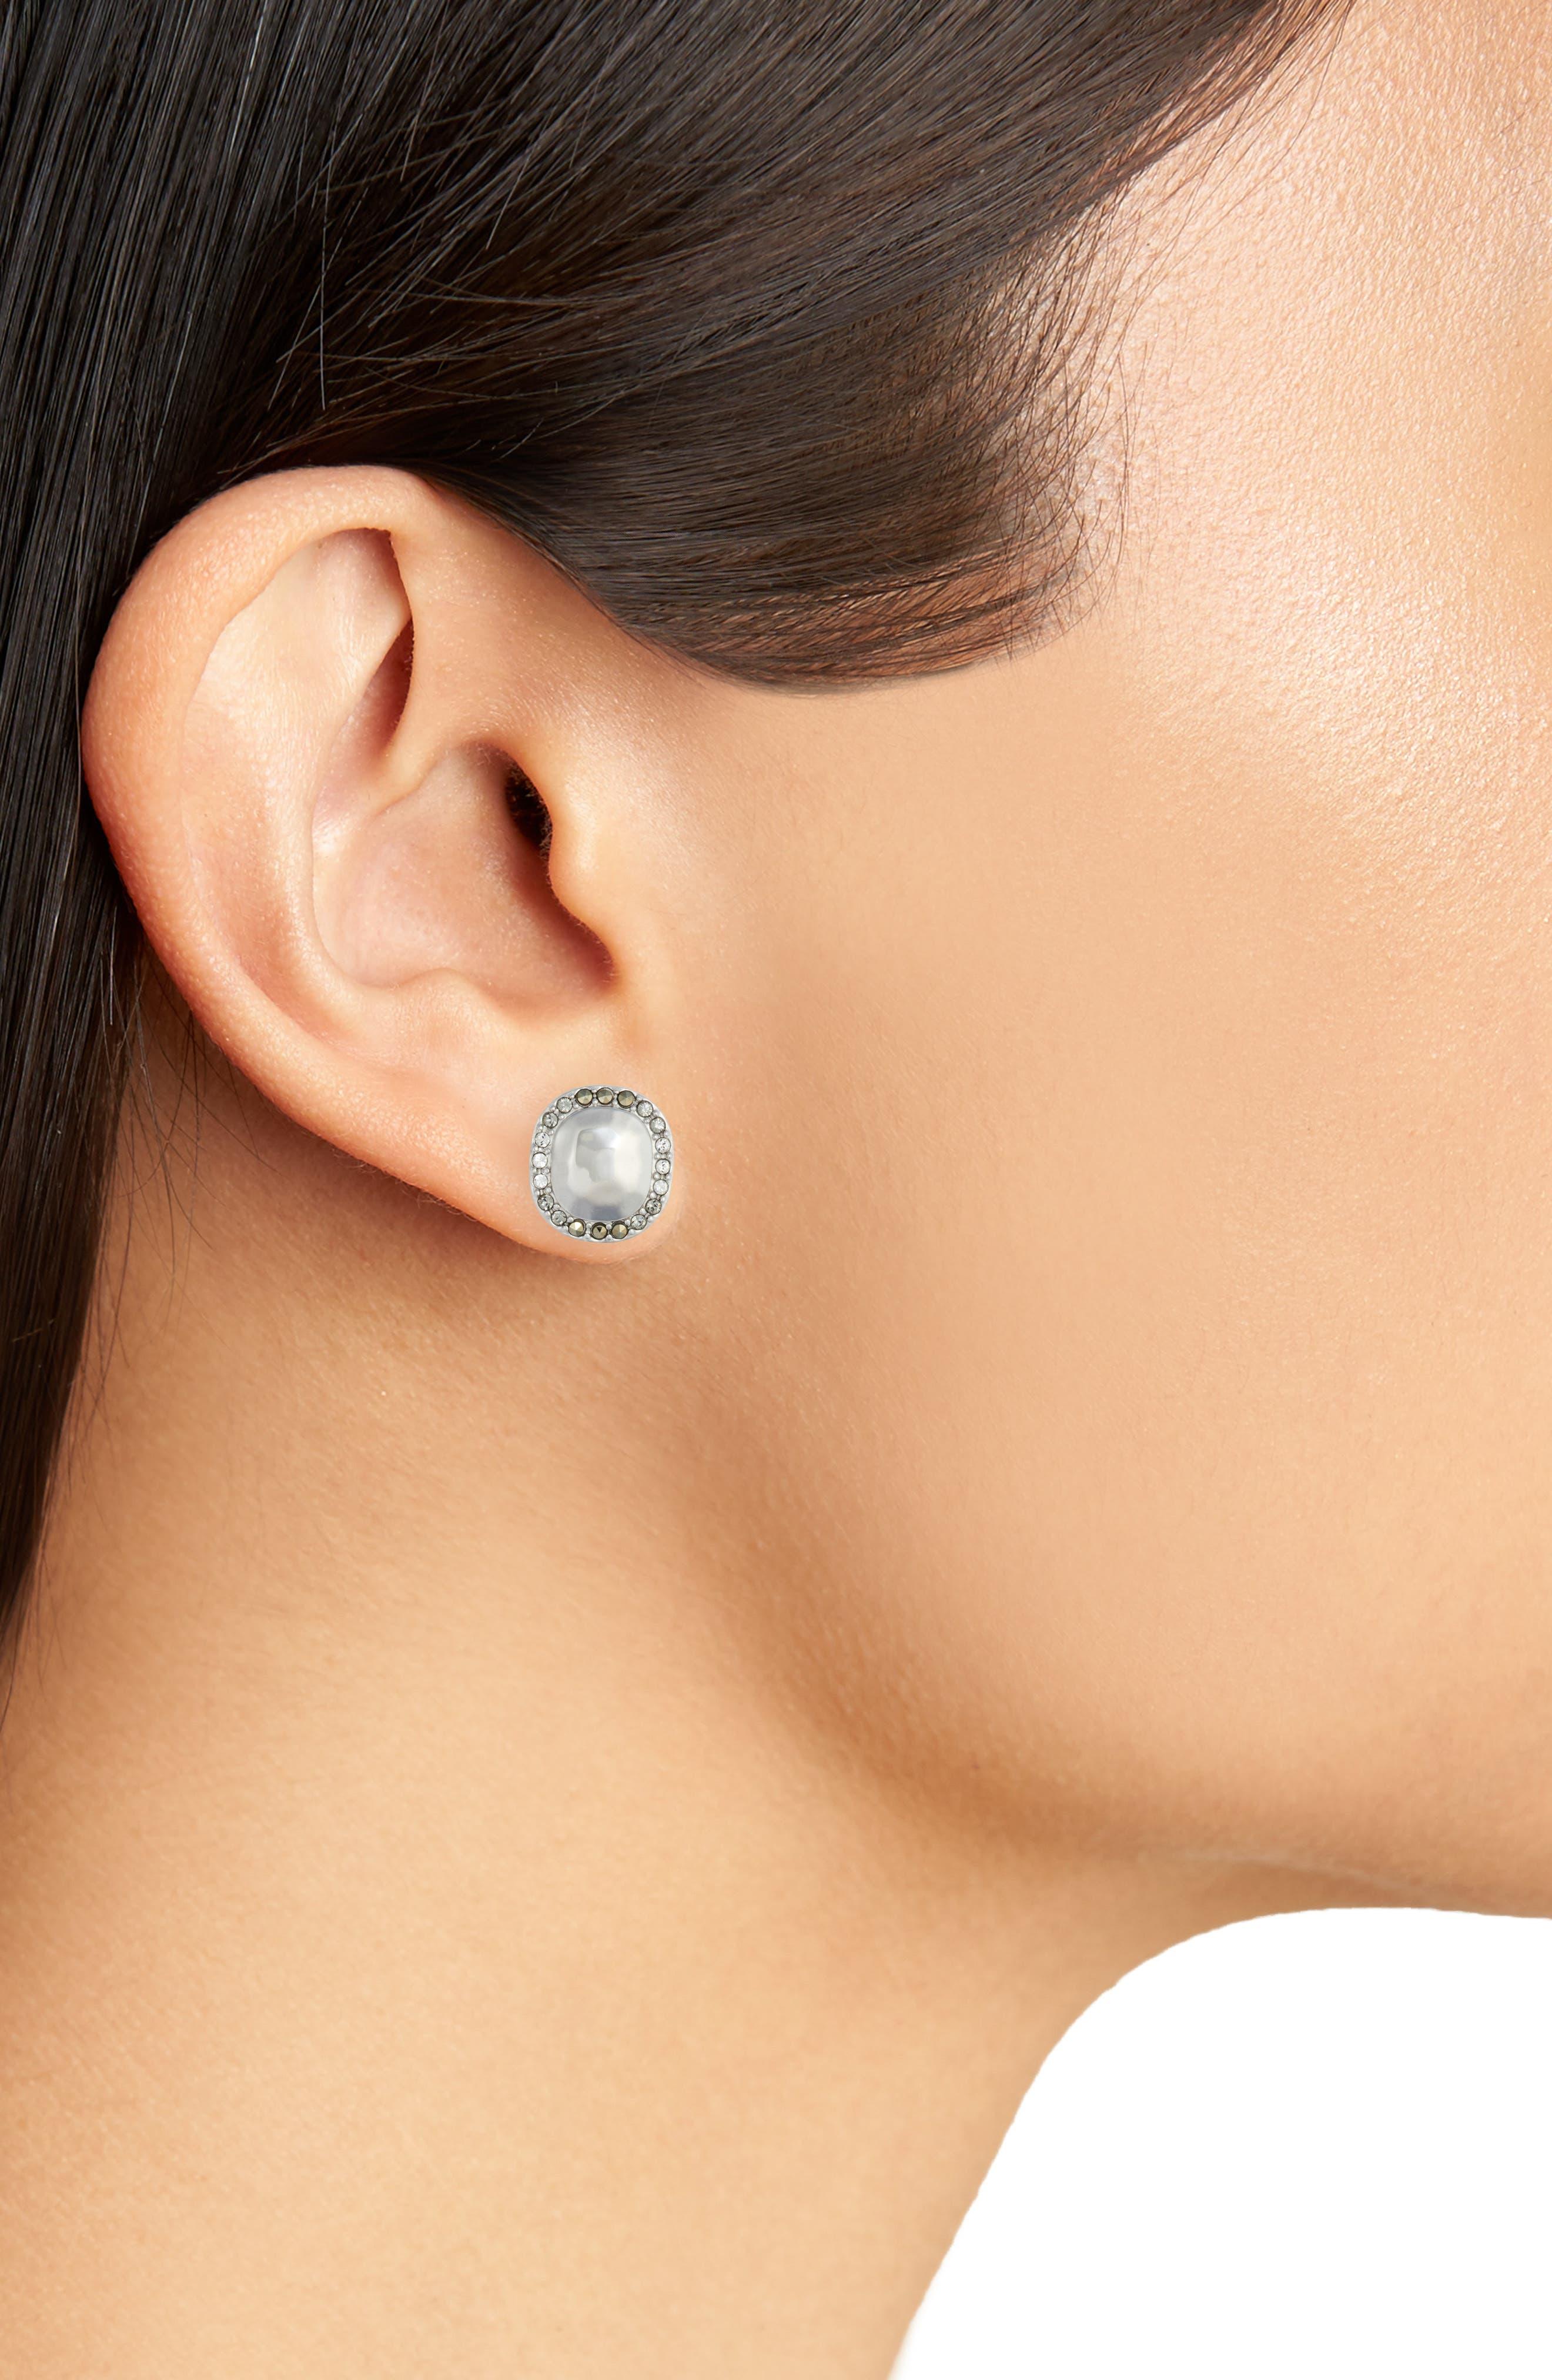 Jewel Stud Earrings,                             Alternate thumbnail 2, color,                             Silver